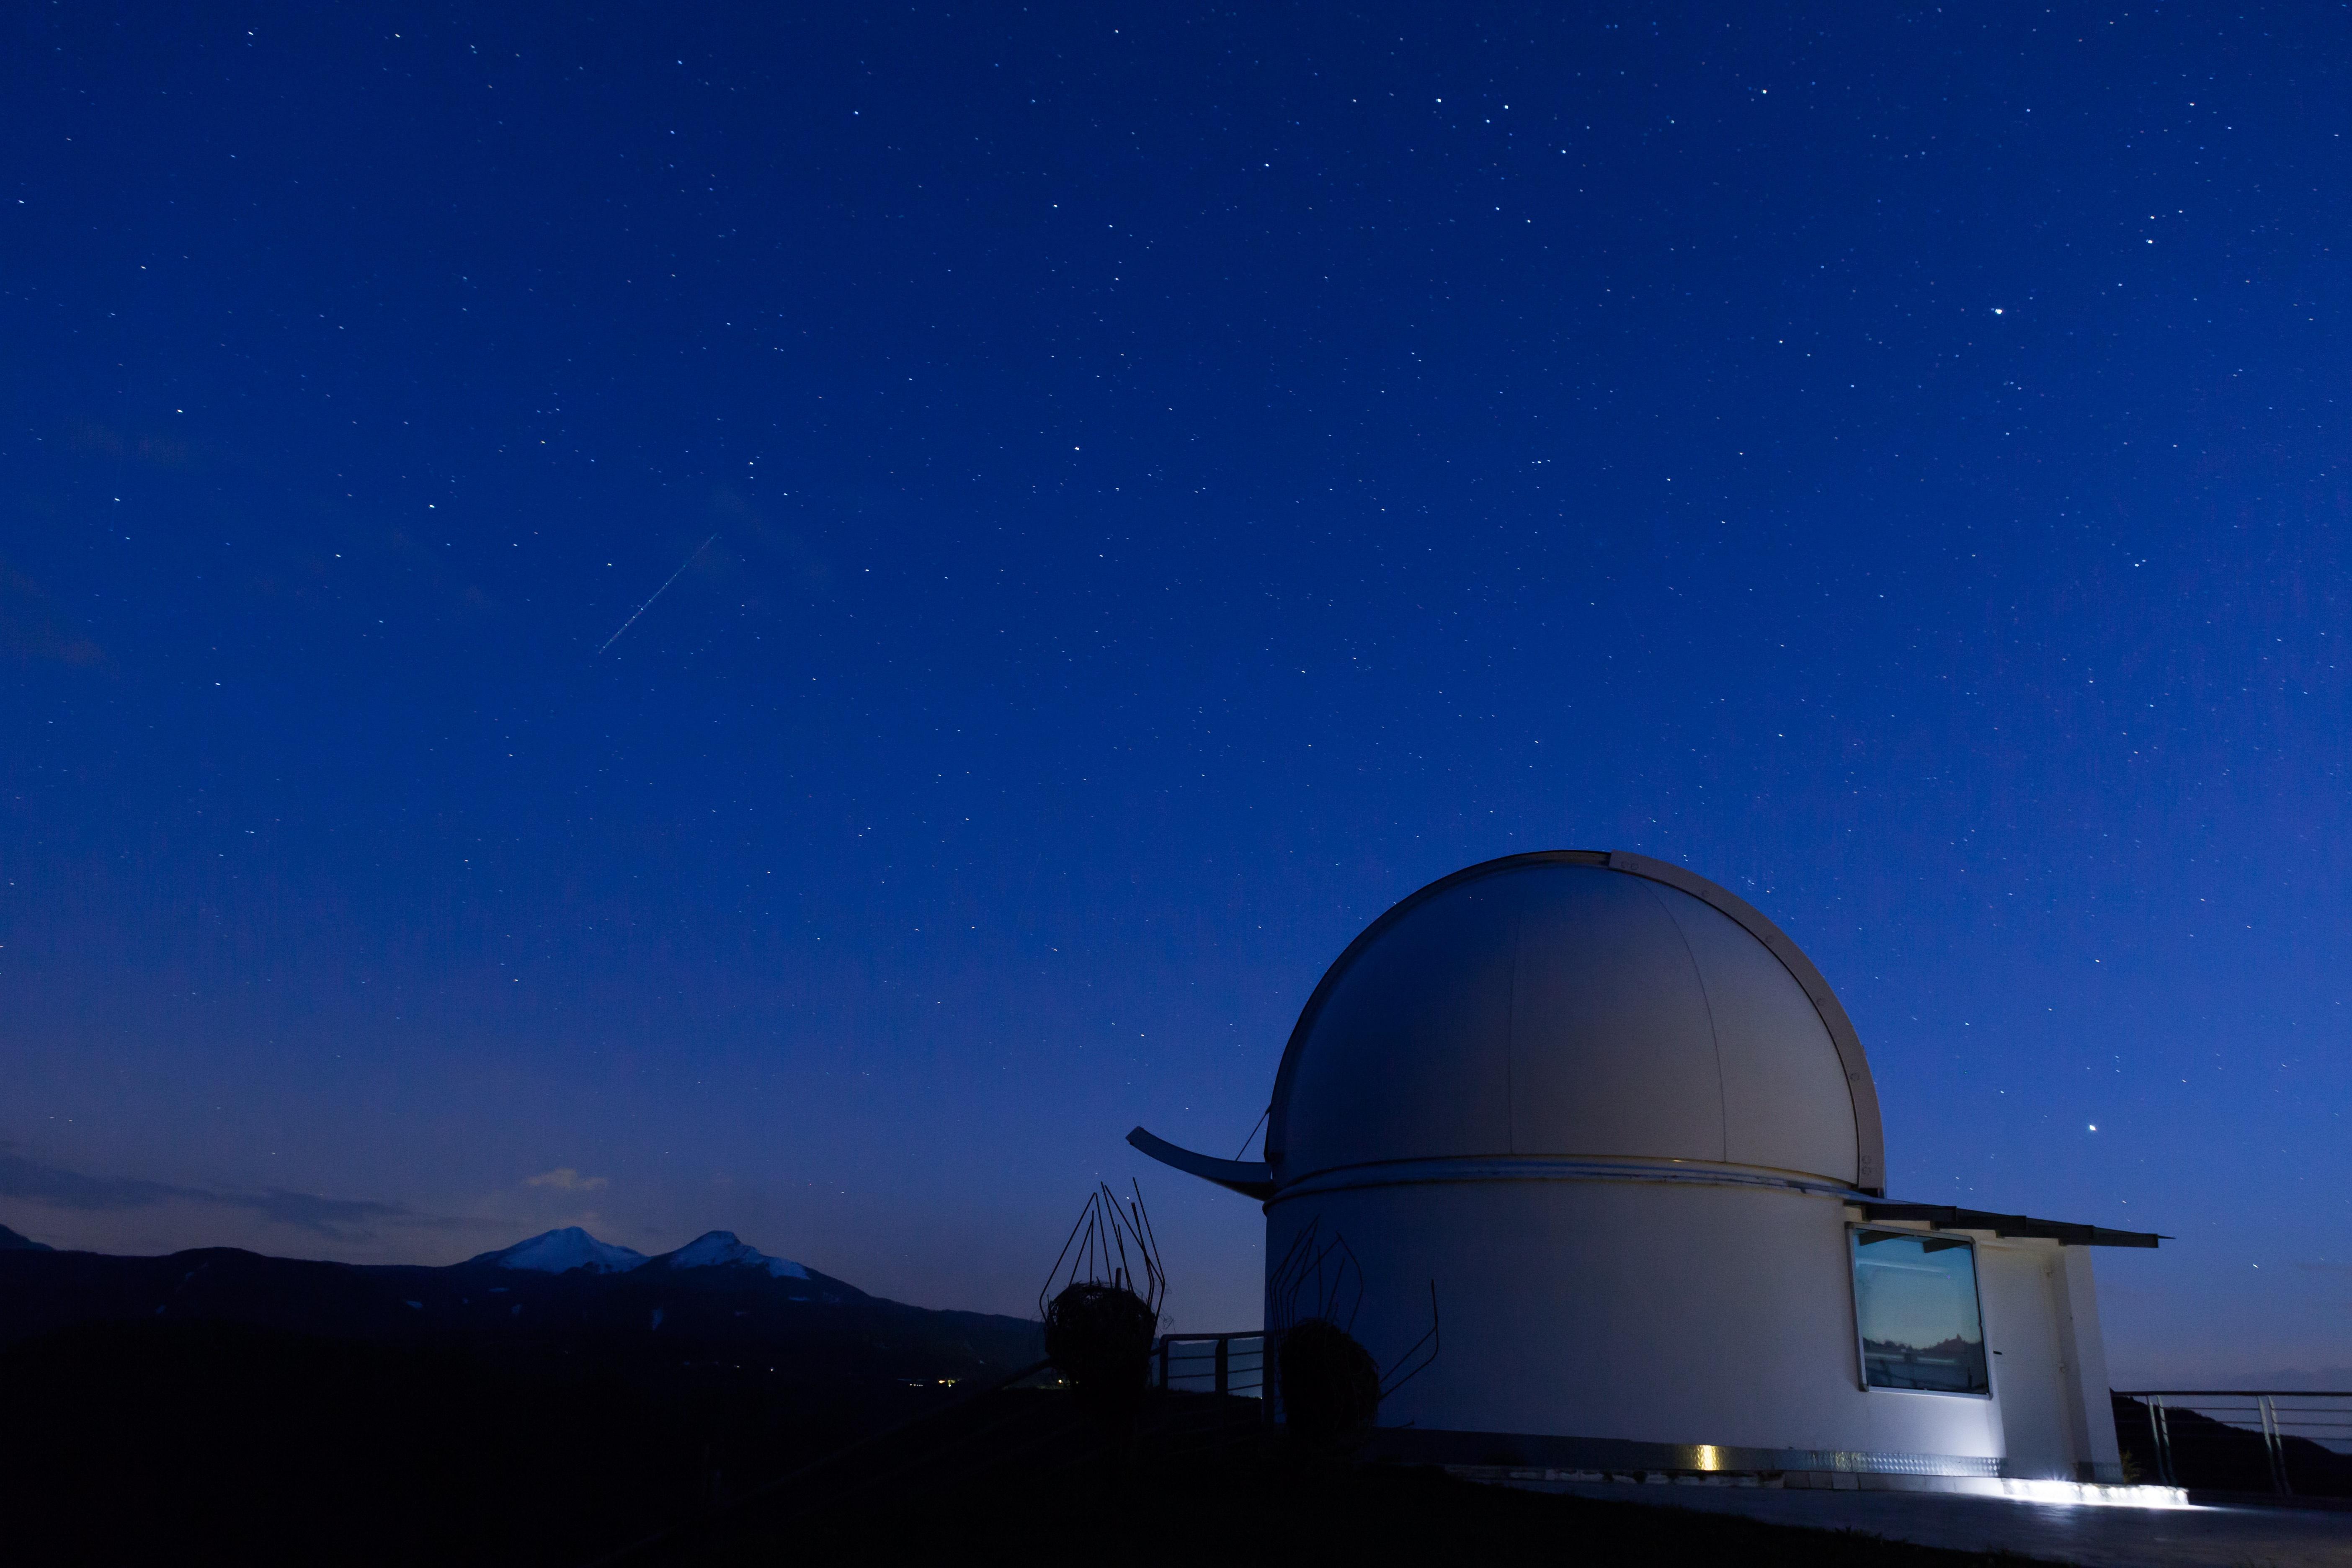 Jual teleskop astronomi teleskop bintang teropong astronomi